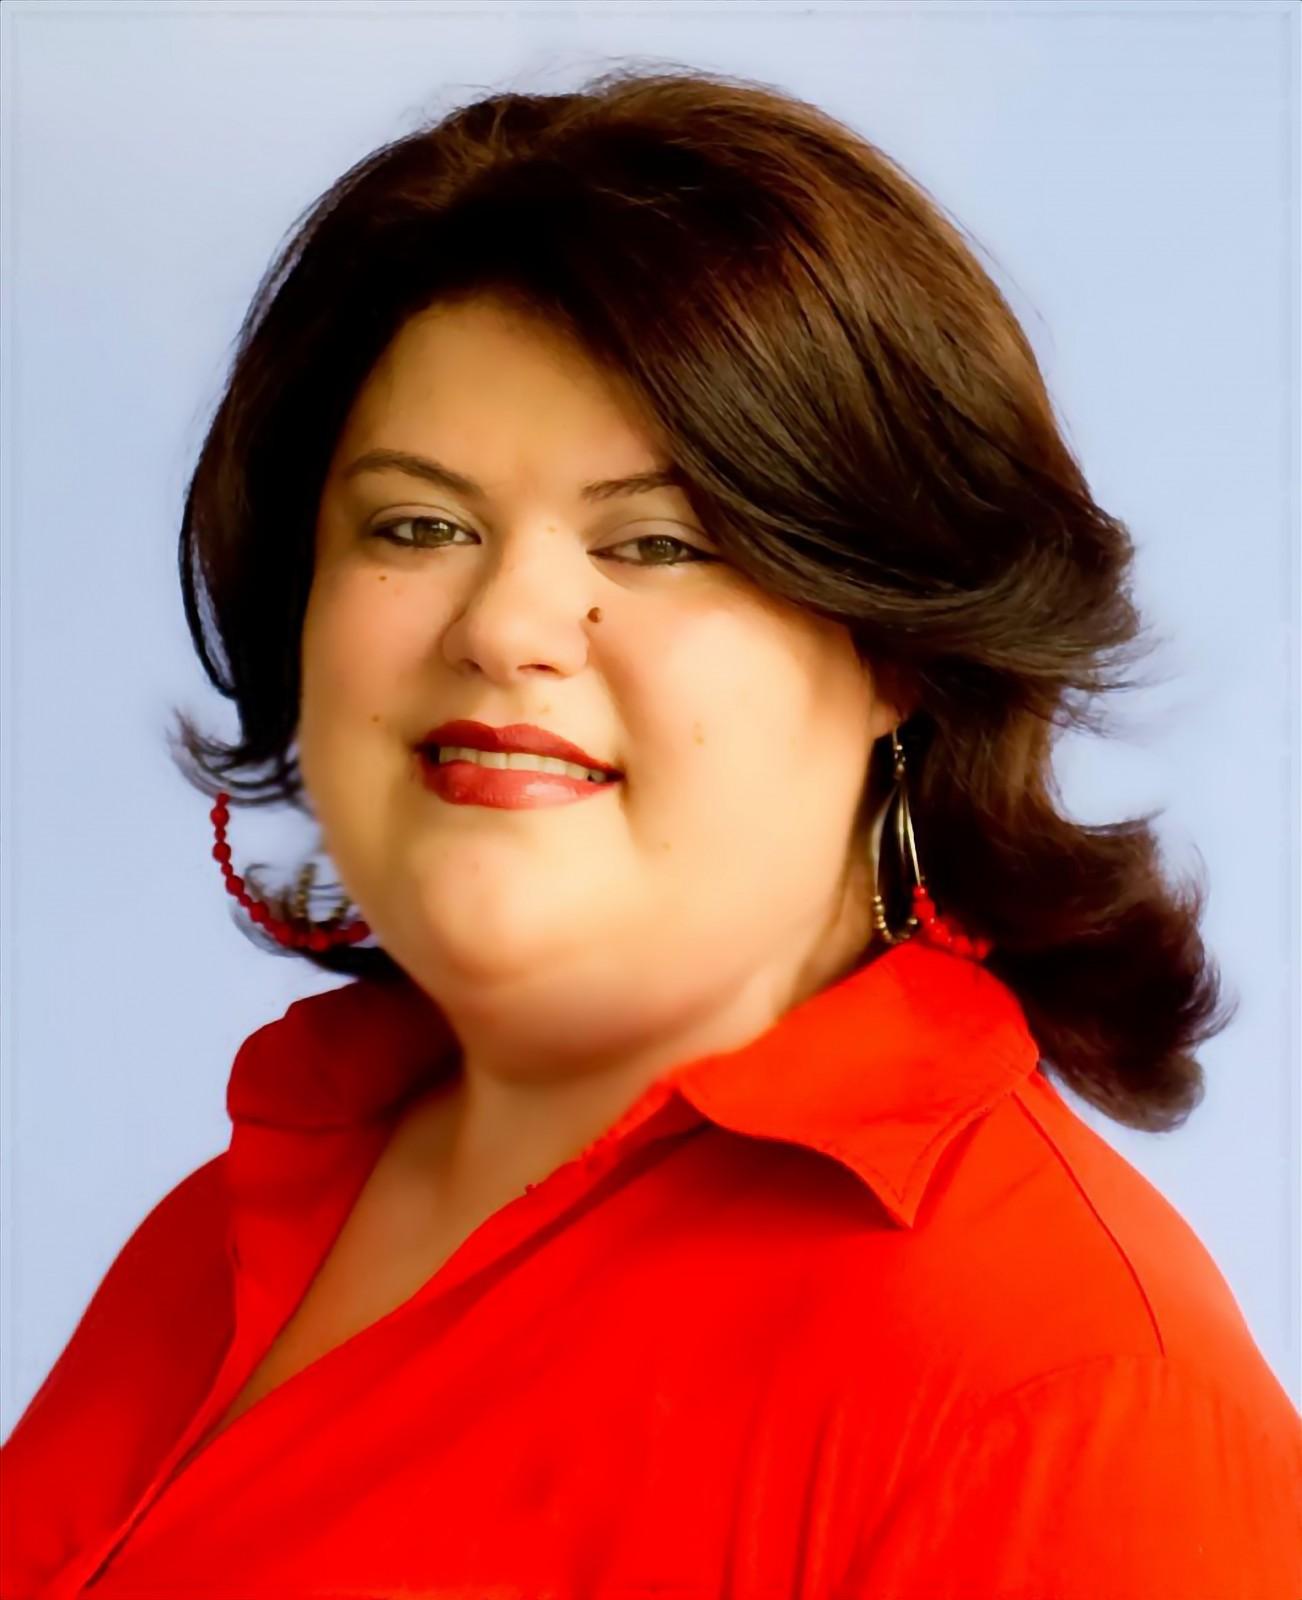 Jessica Monforti Lavariega